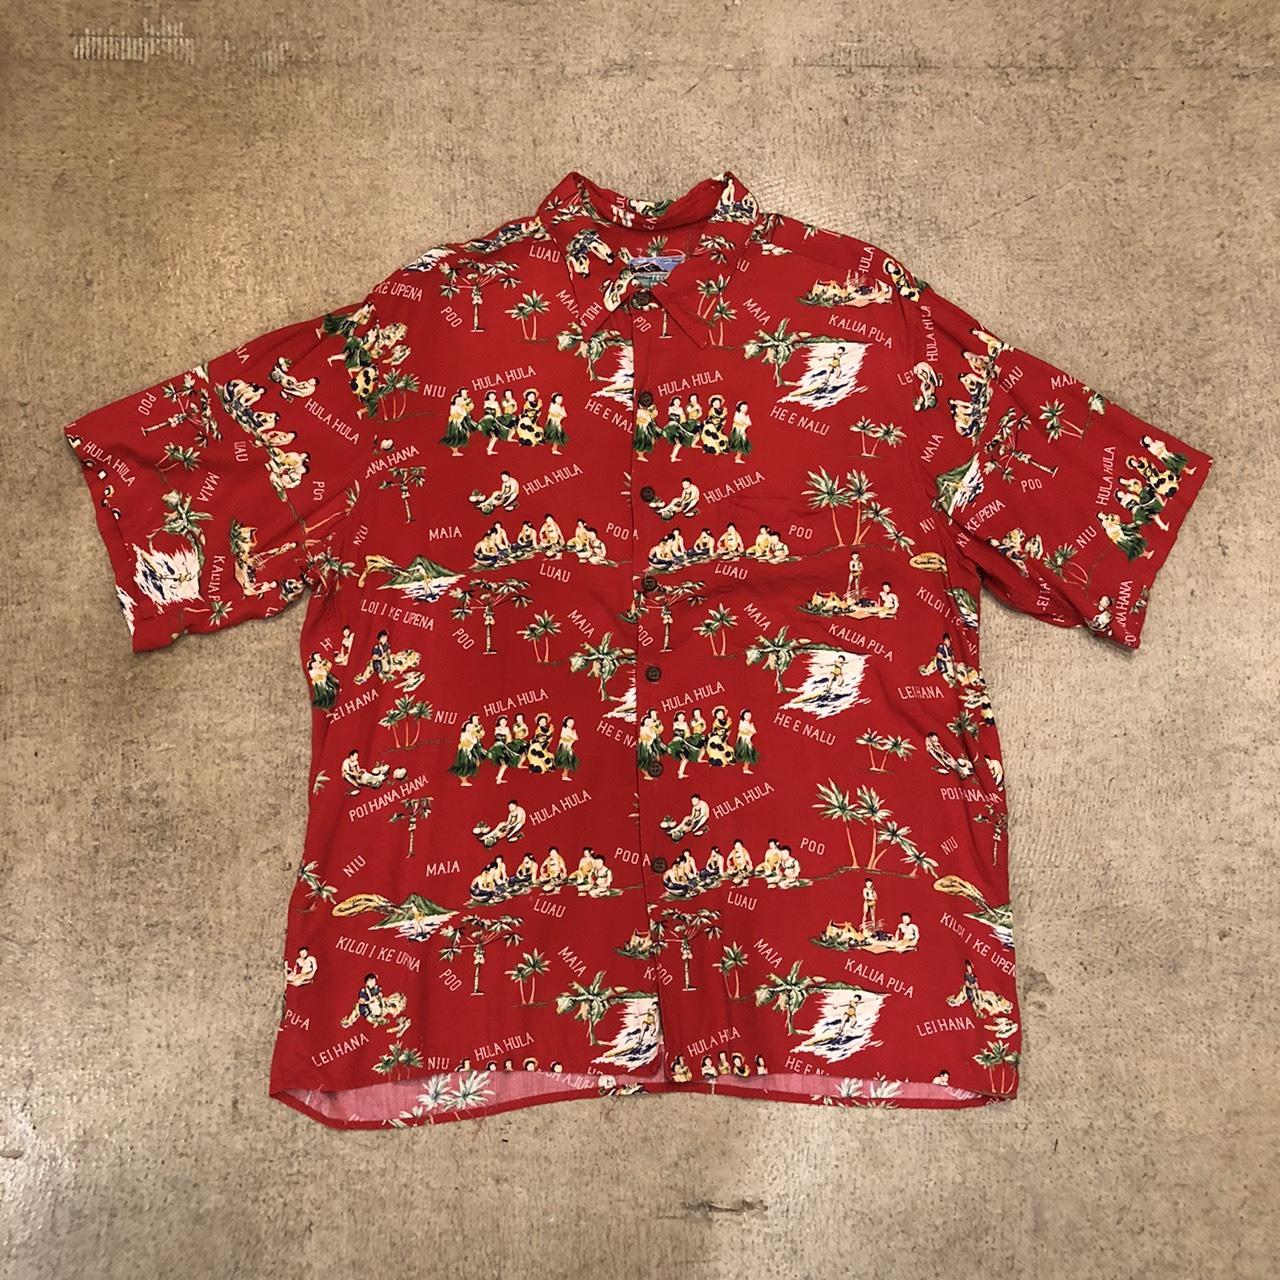 Reyn Spooner 80's Aloha Shirts ¥6,900+tax